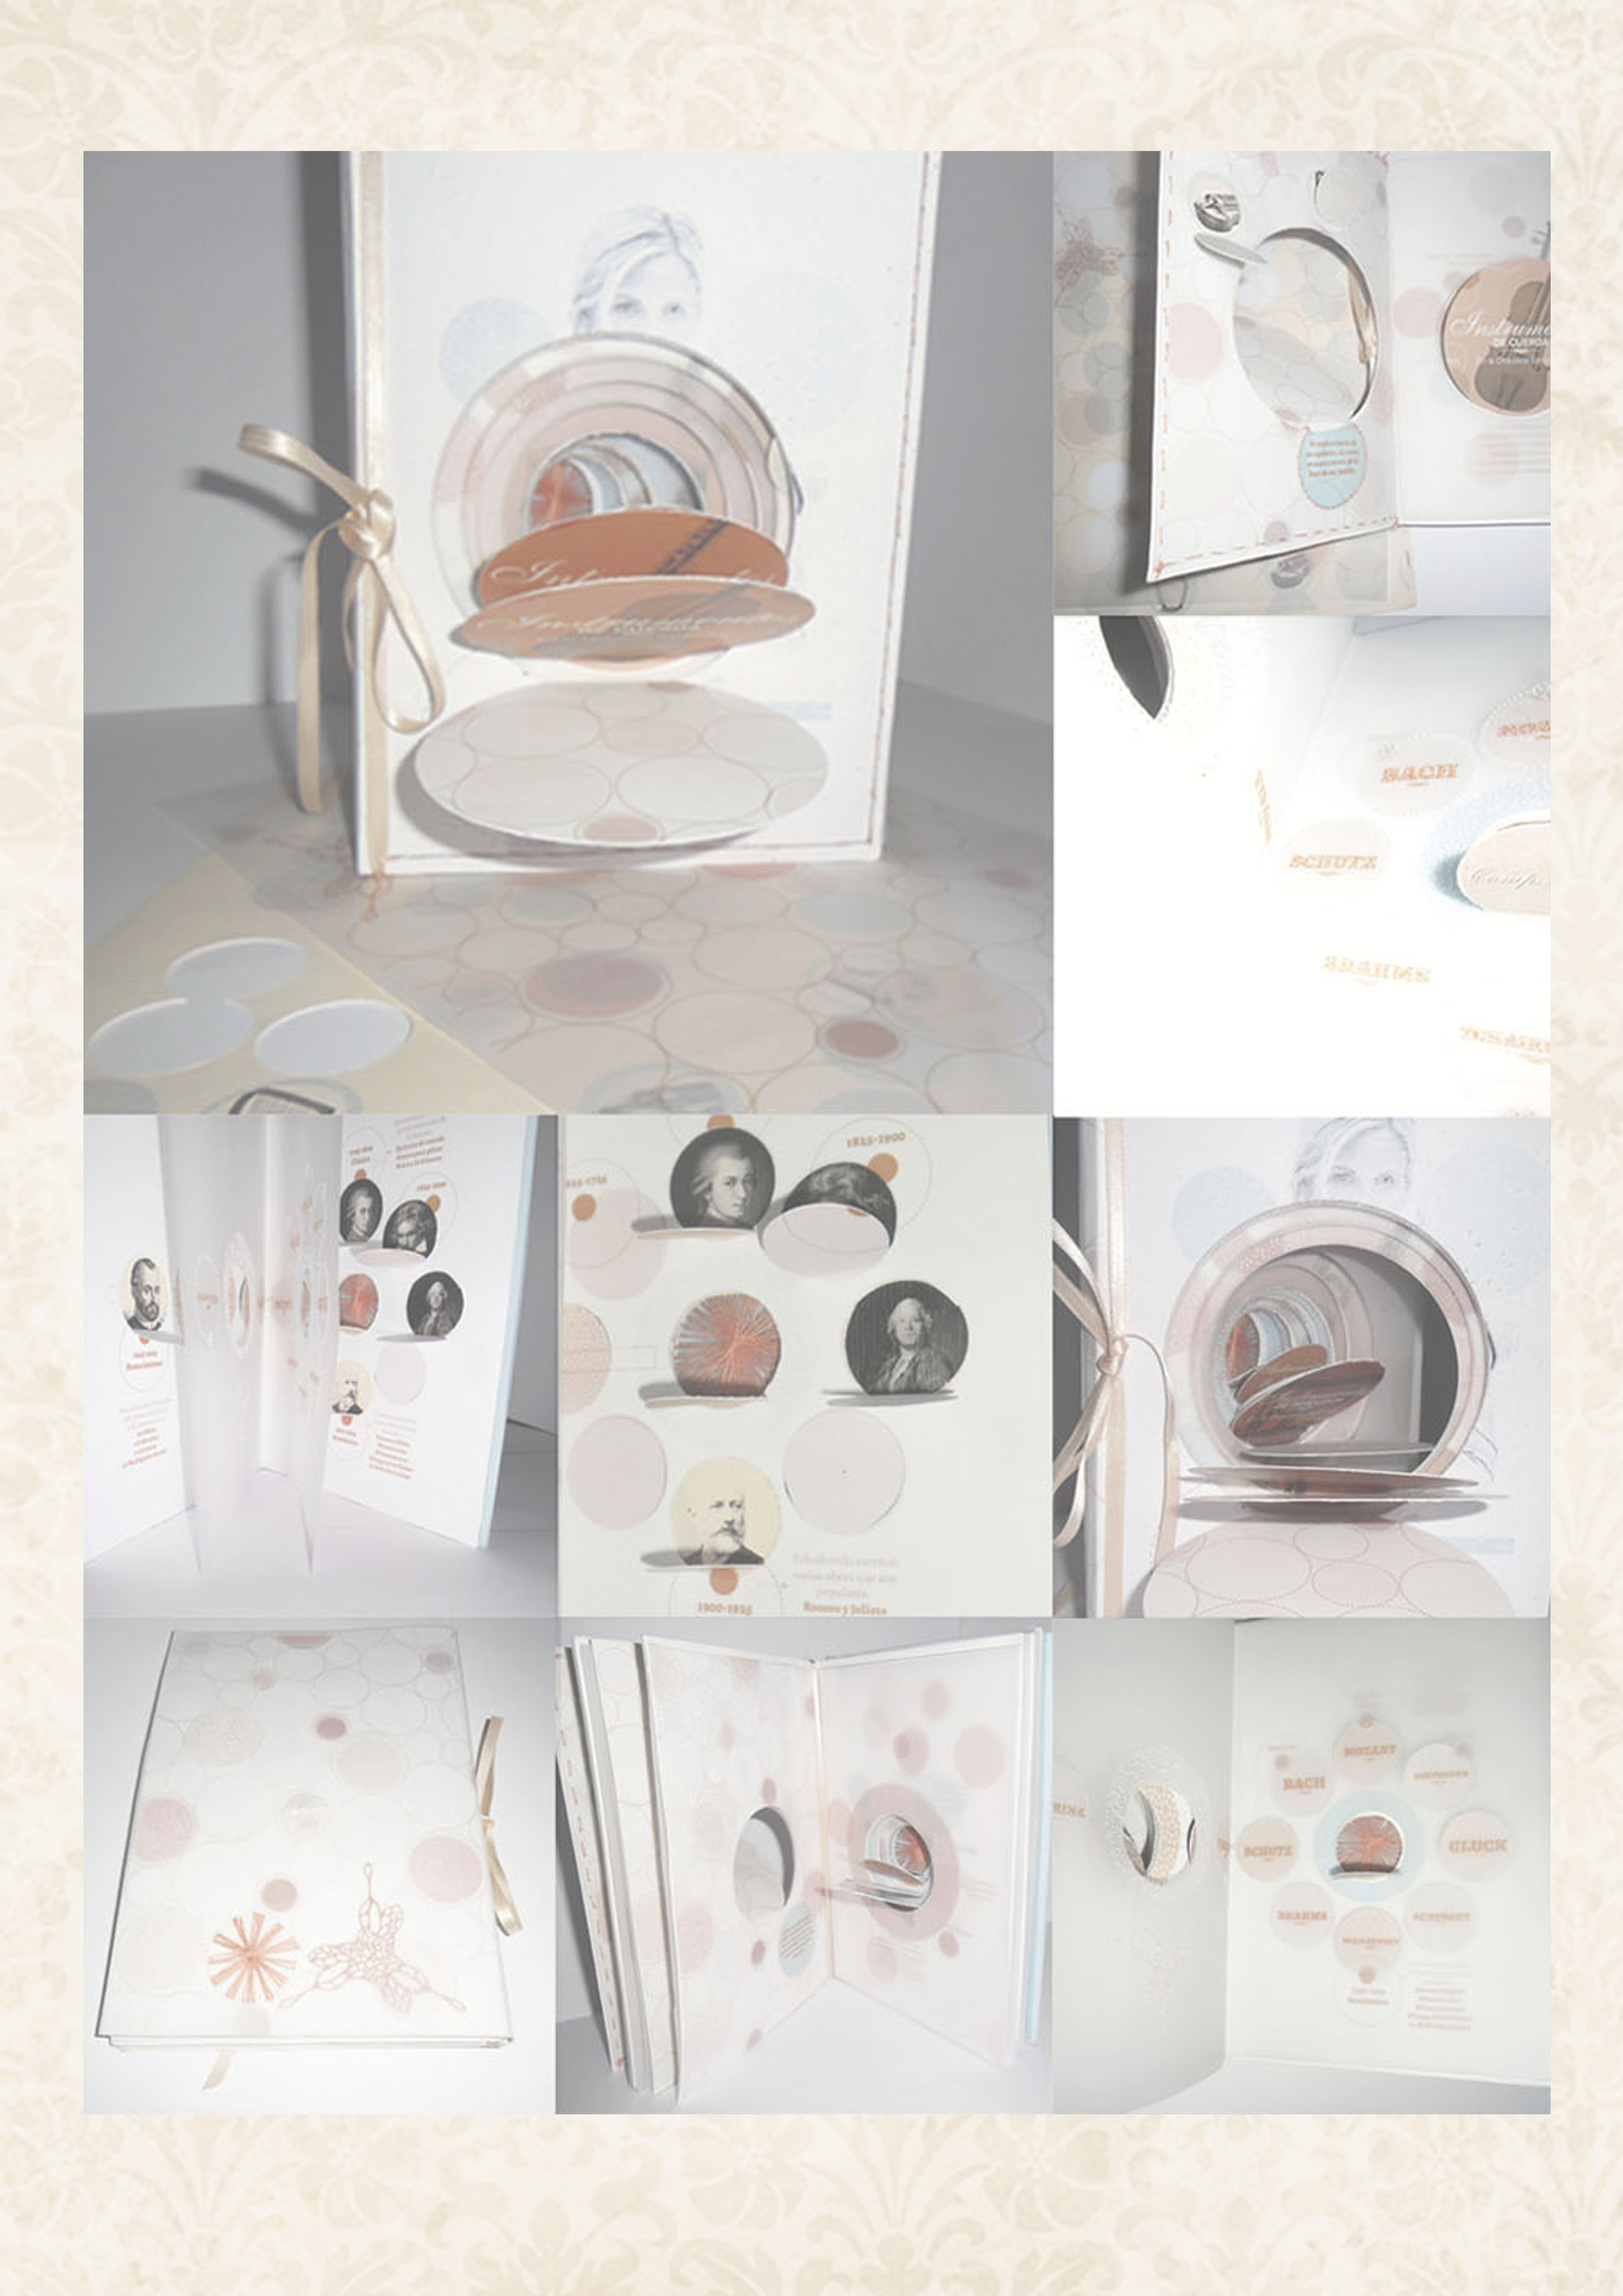 Sistema Para Un Evento Libro Objeto M Sica Cl Sica Pinterest  # Bitacora Muebles